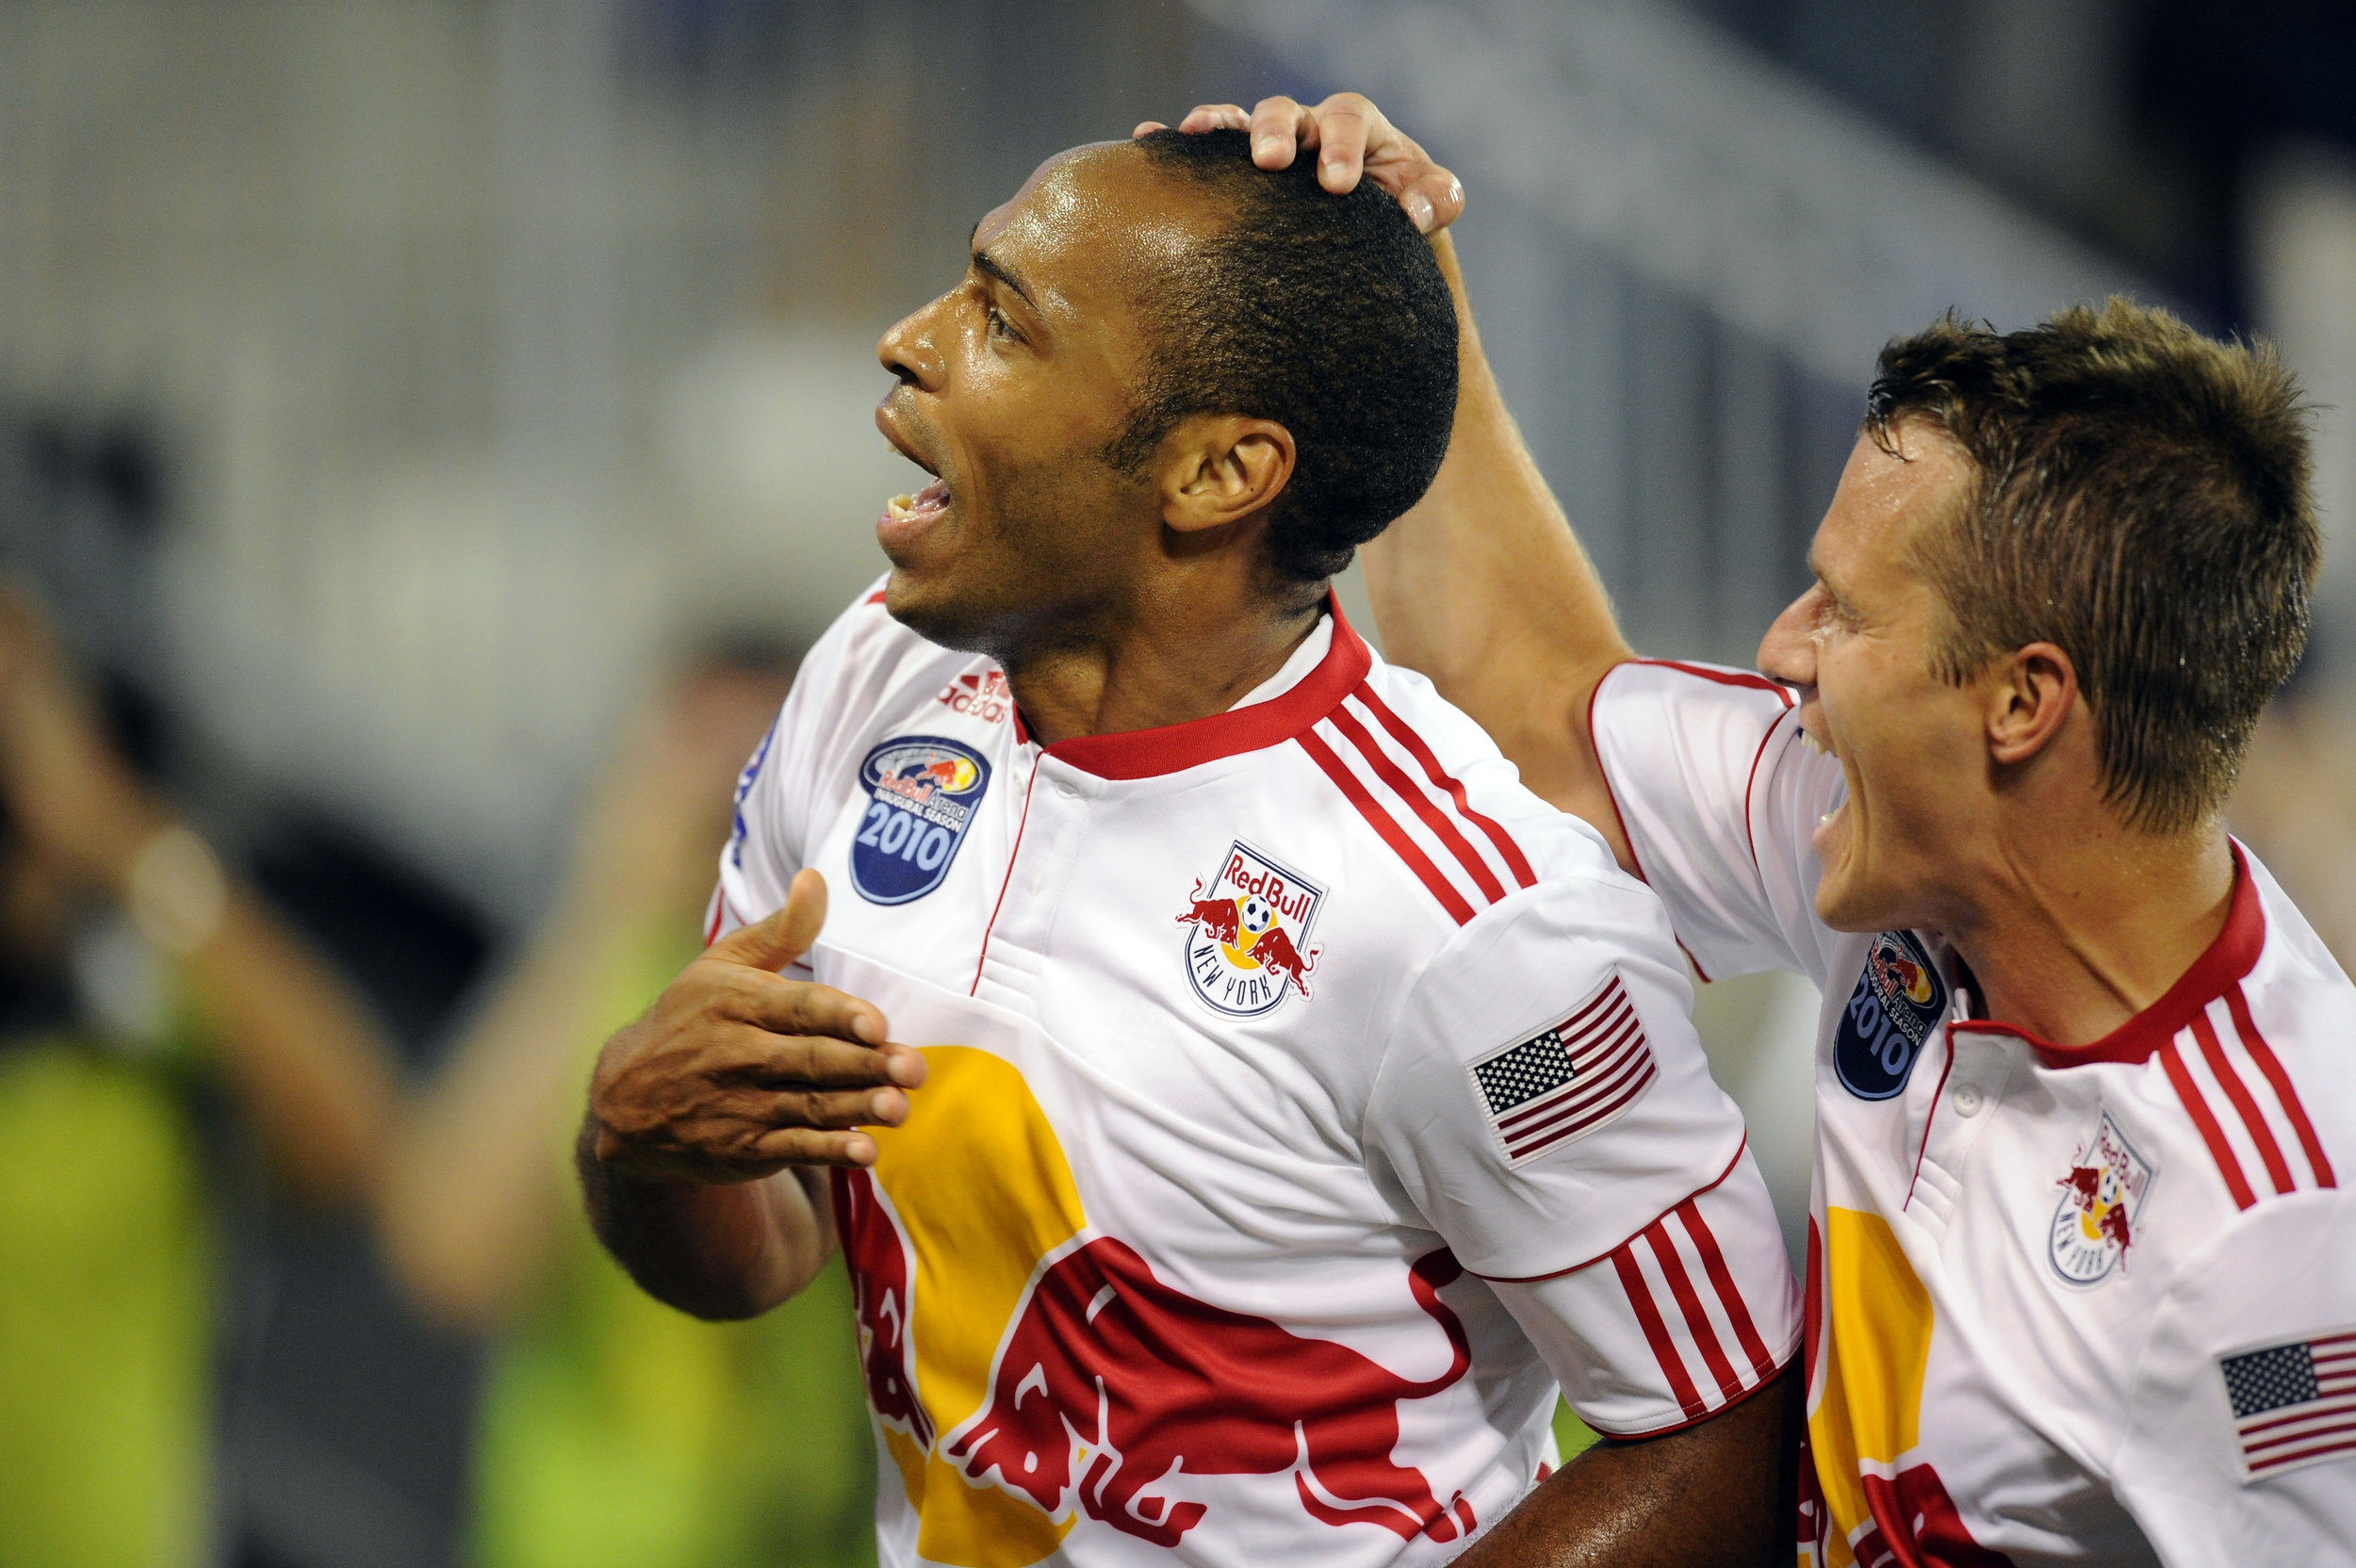 Thierry Henry scorer for New York Red Bulls i en venskabskamp mod Tottenham.   Foto: Getty Images